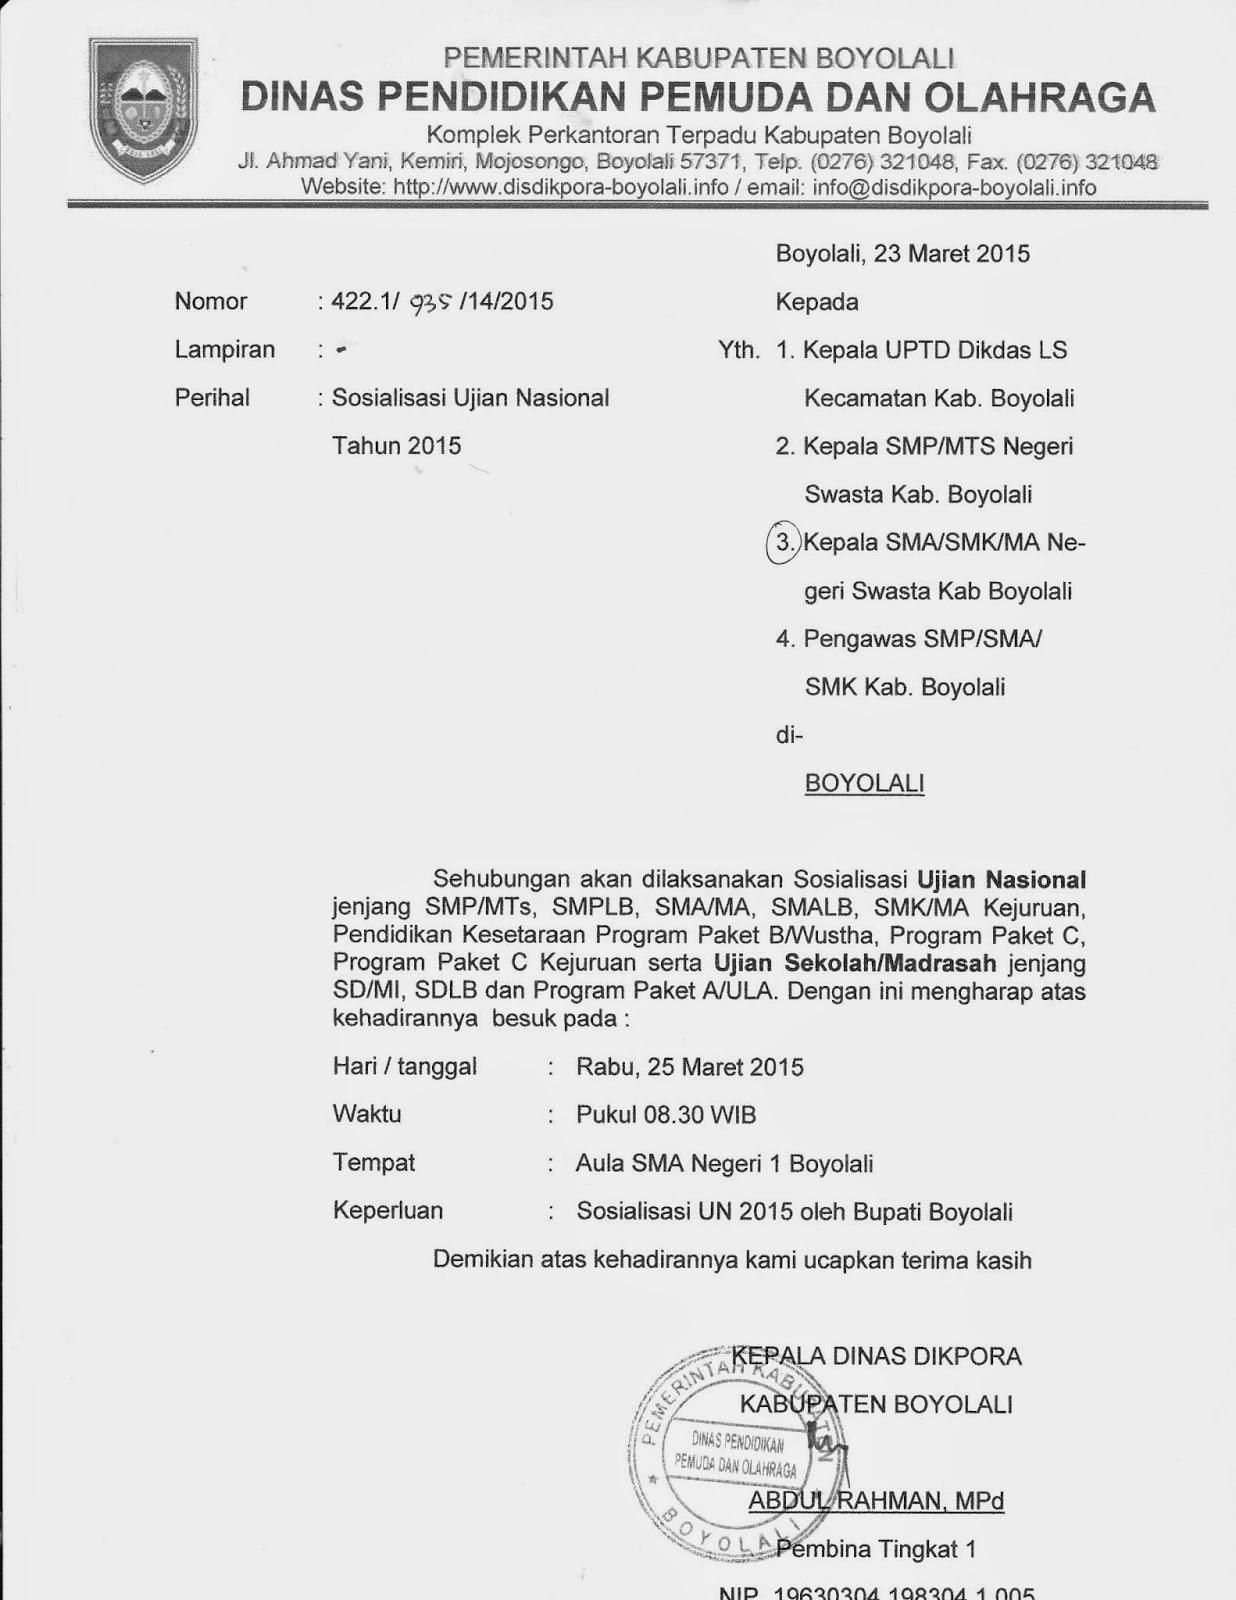 Info Sma Smk Kabupaten Boyolali Undangan Sosialisasi Un 2015 Oleh Bupati